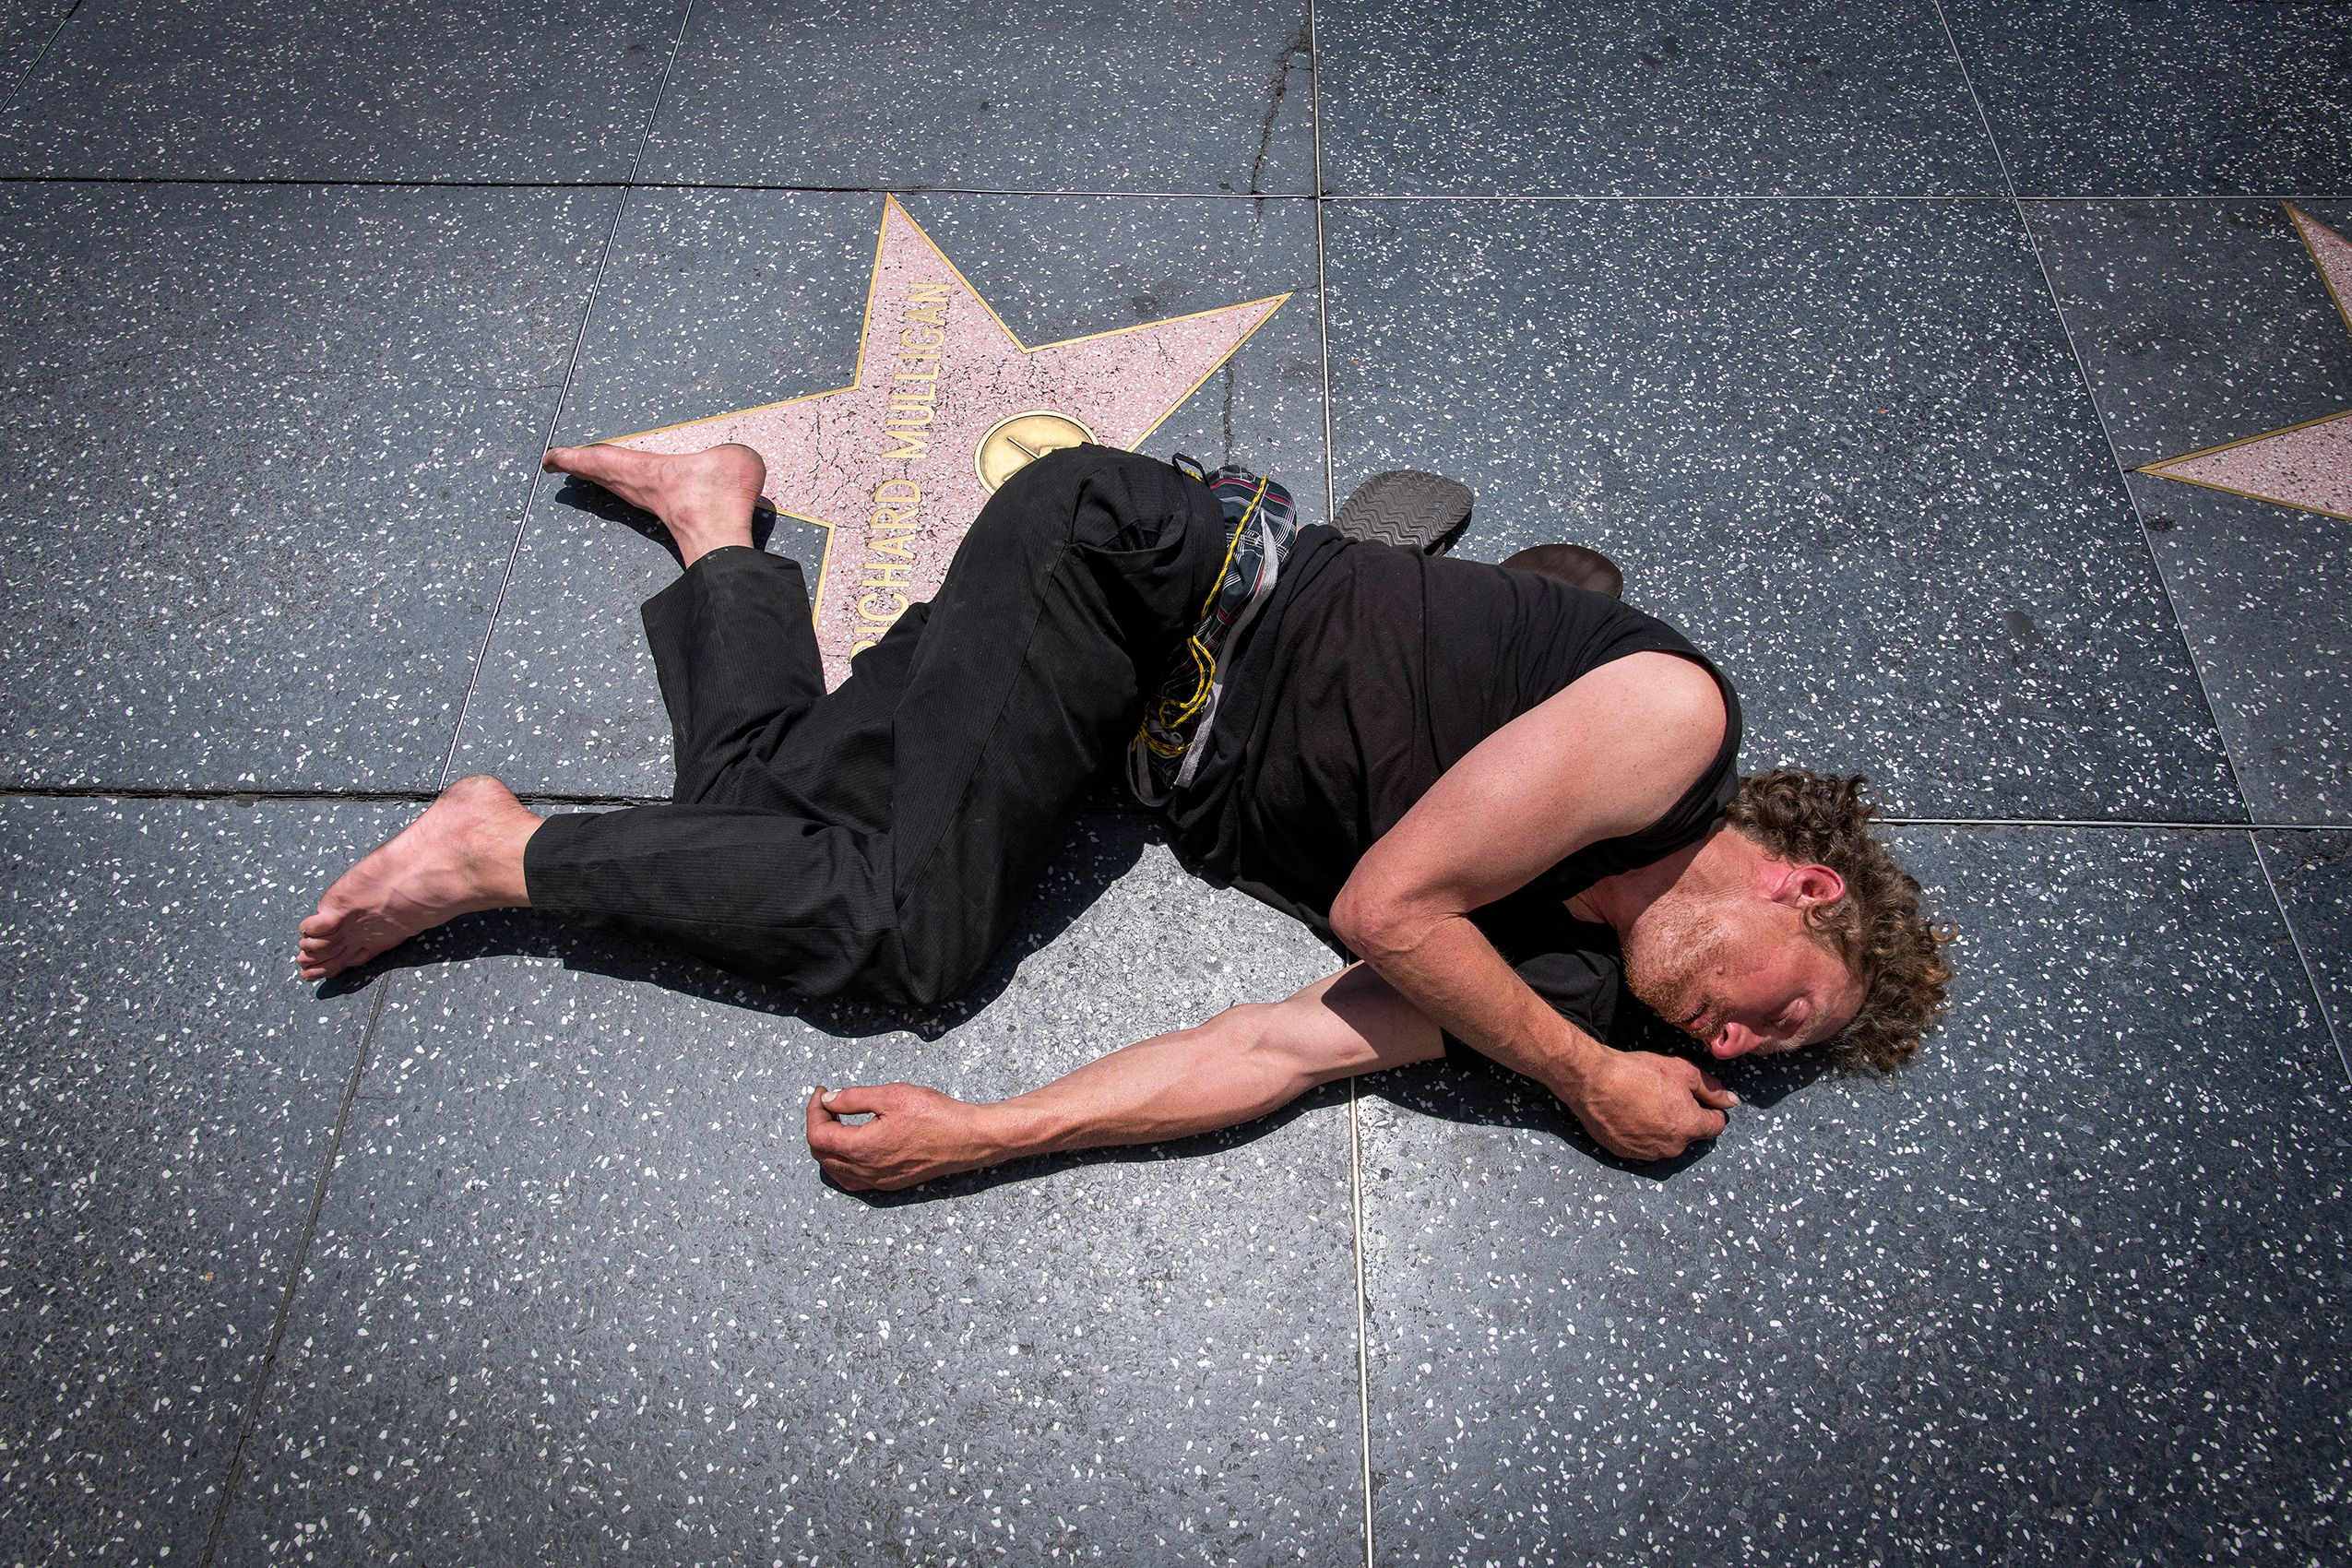 USA_CA_Hollywood_3713.jpg